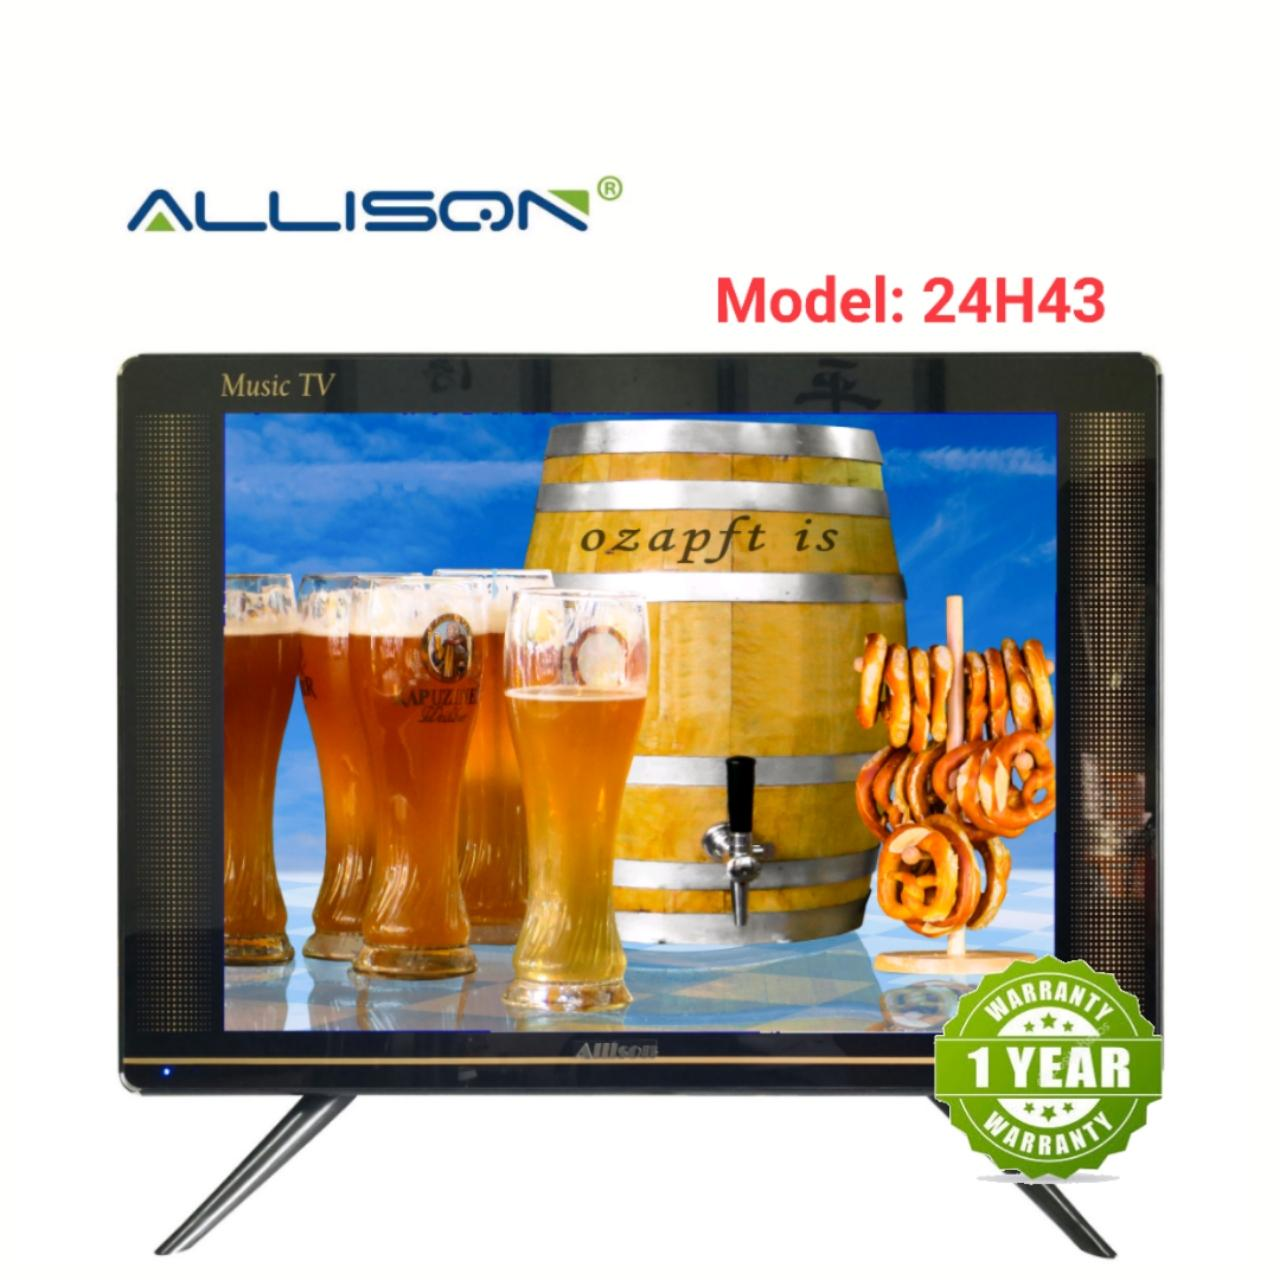 ALLISON LED-24H43 Screen 20